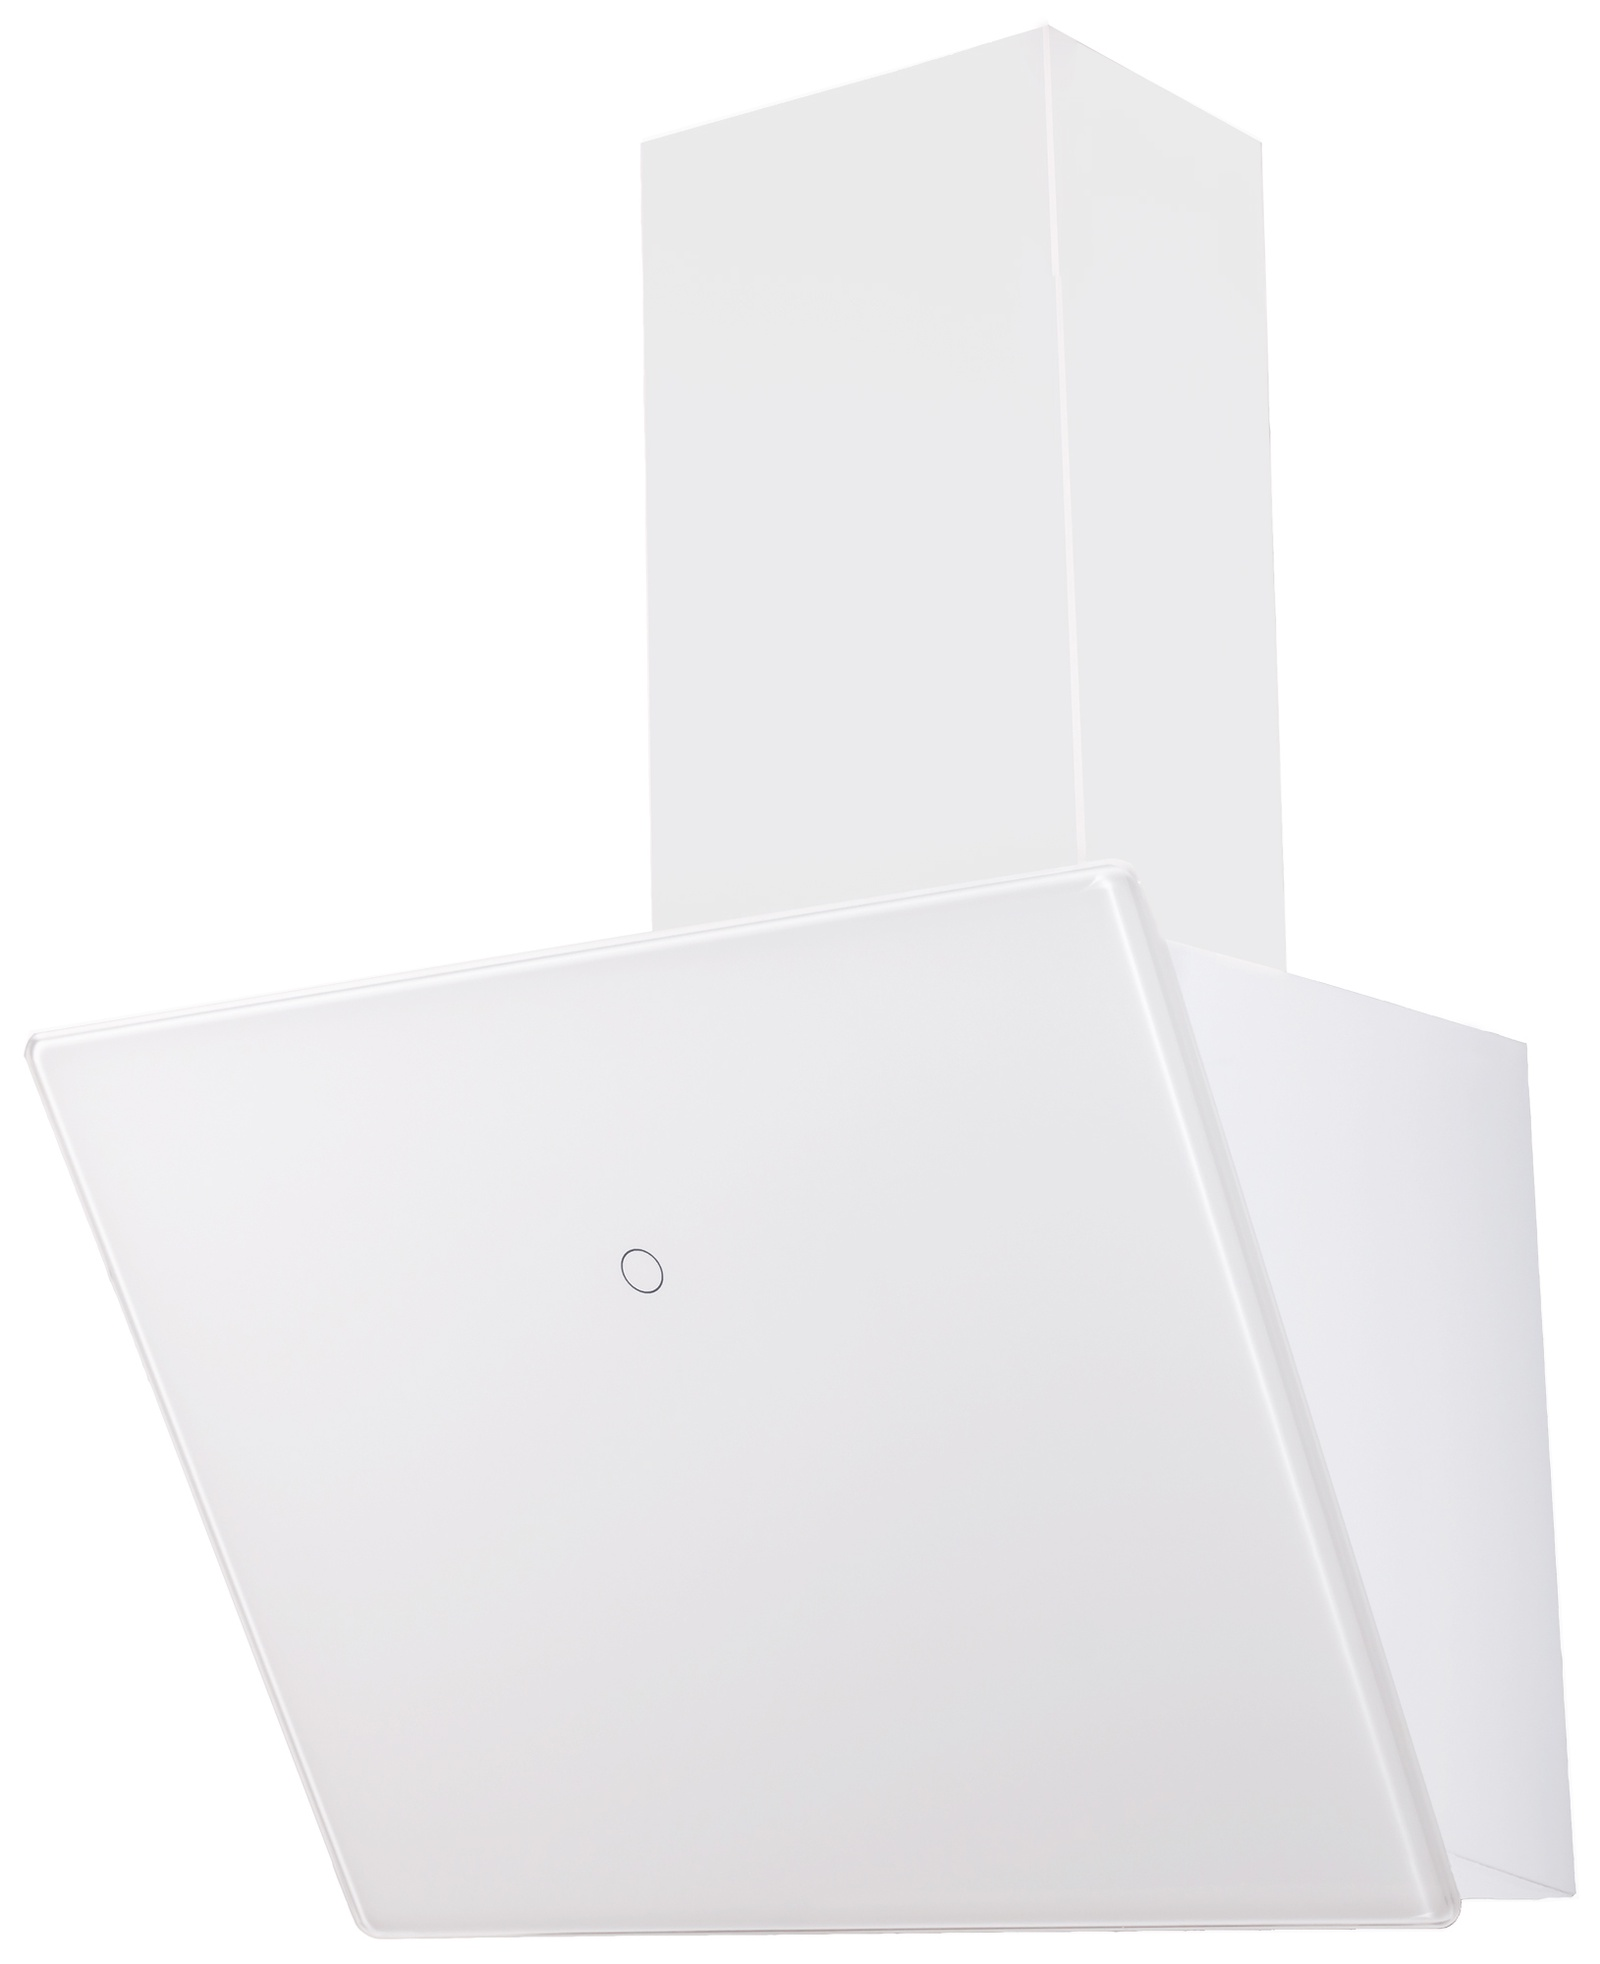 Вытяжка Exiteq EX-1156 white, 30212, белый